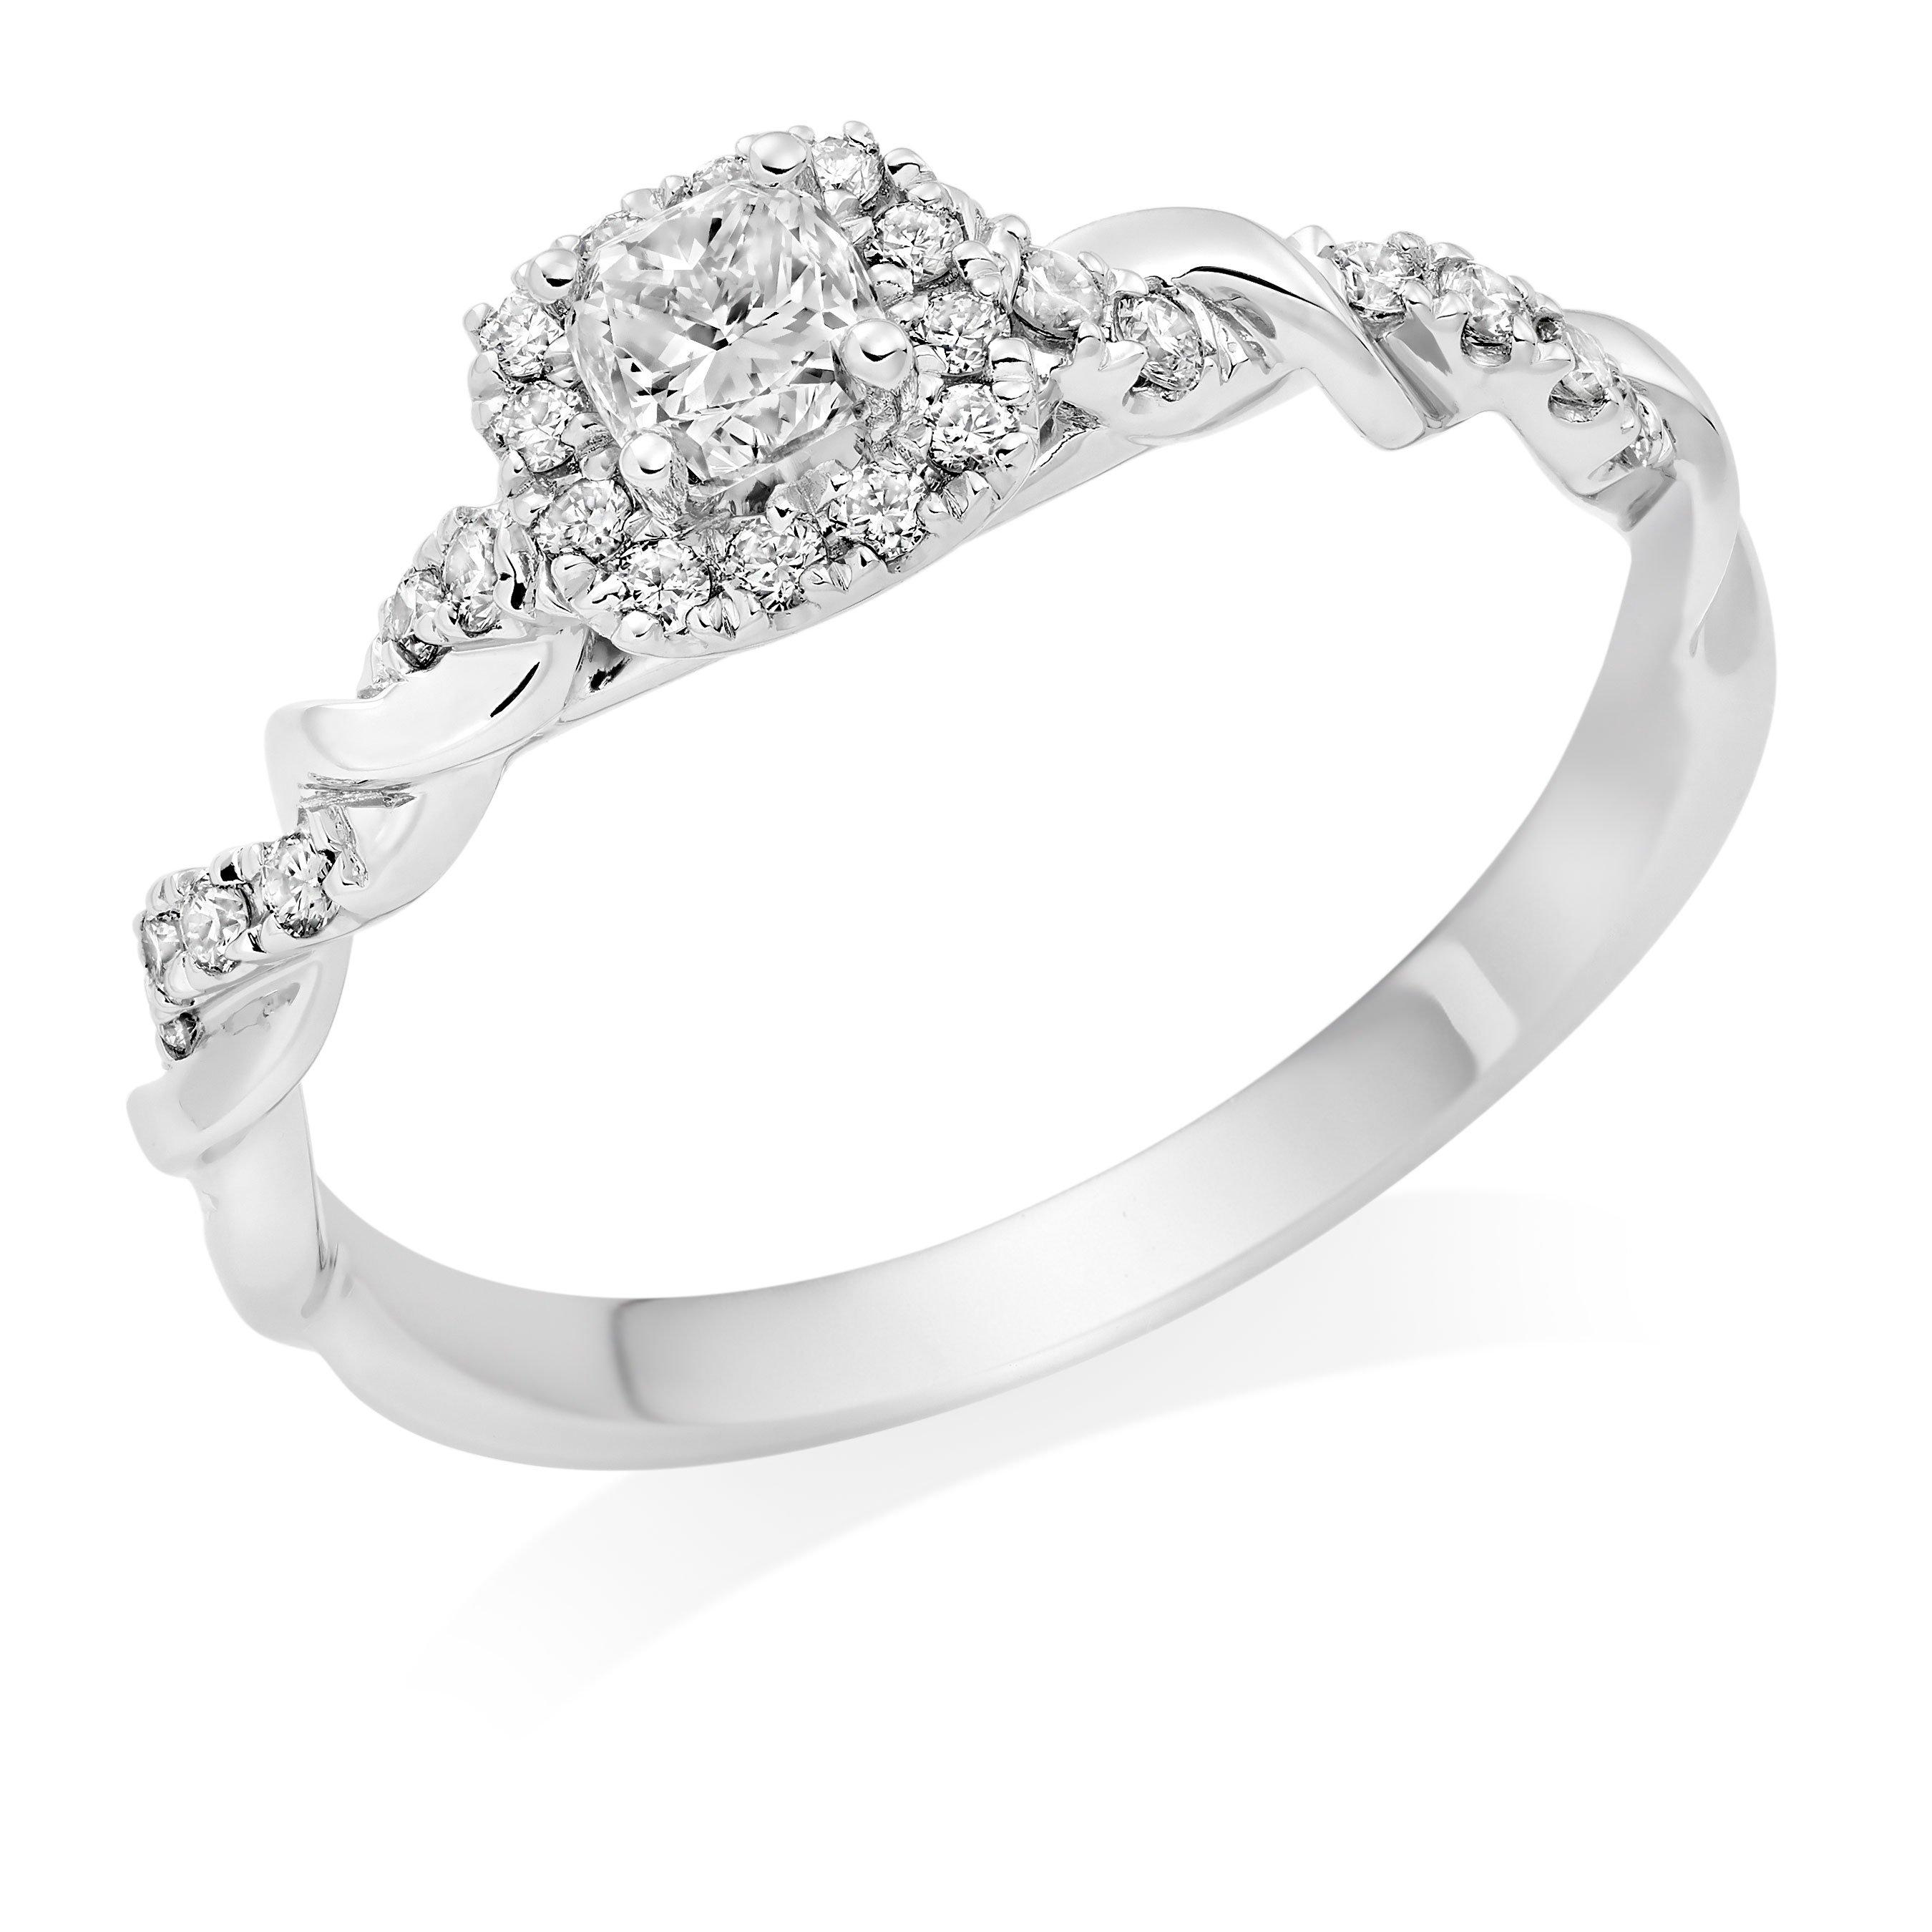 Entwine Platinum Diamond Cushion Cut Halo Ring